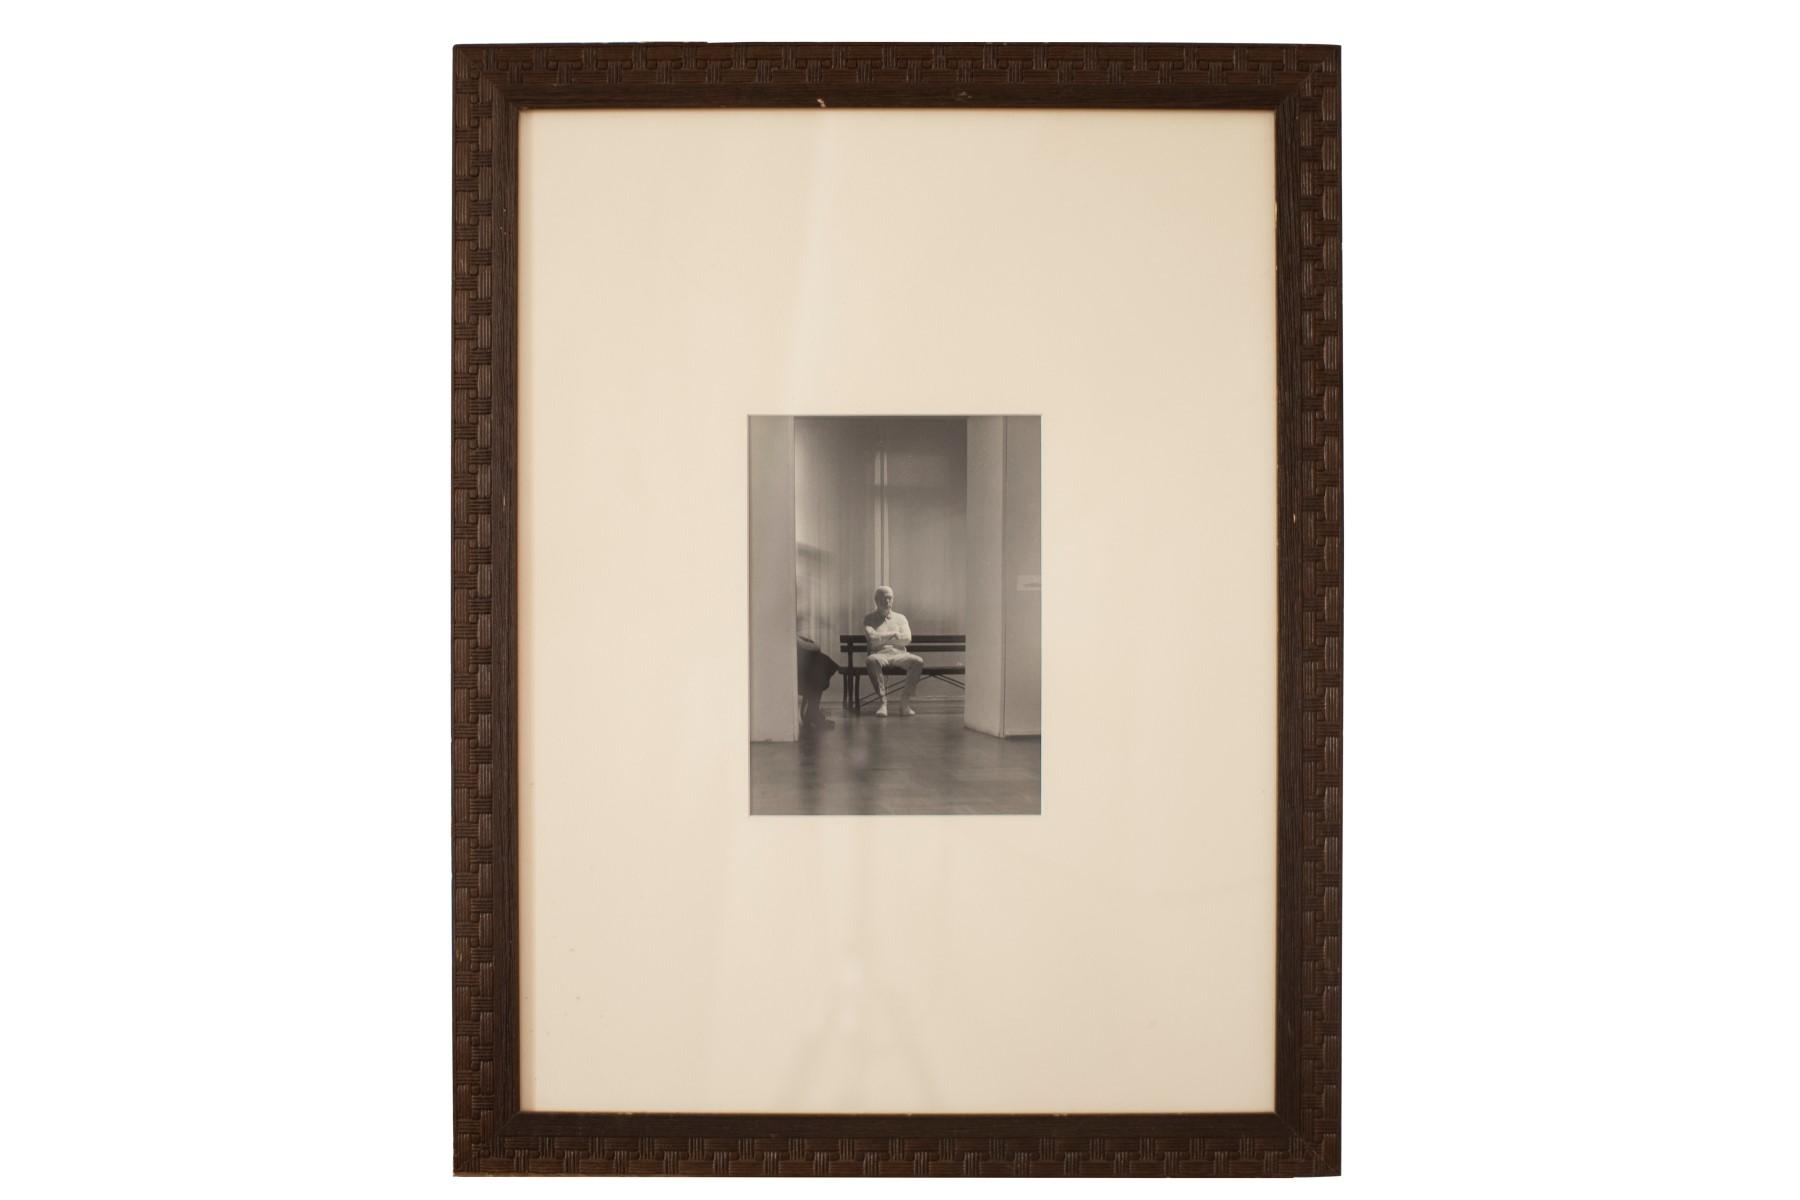 #112 Deoraz Sigl, Man in the Waiting Room, Photo, Venice, Around 1980 | Deoraz Sigl, Mann im Warteraum, Foto, Venedig, um 1980 Image